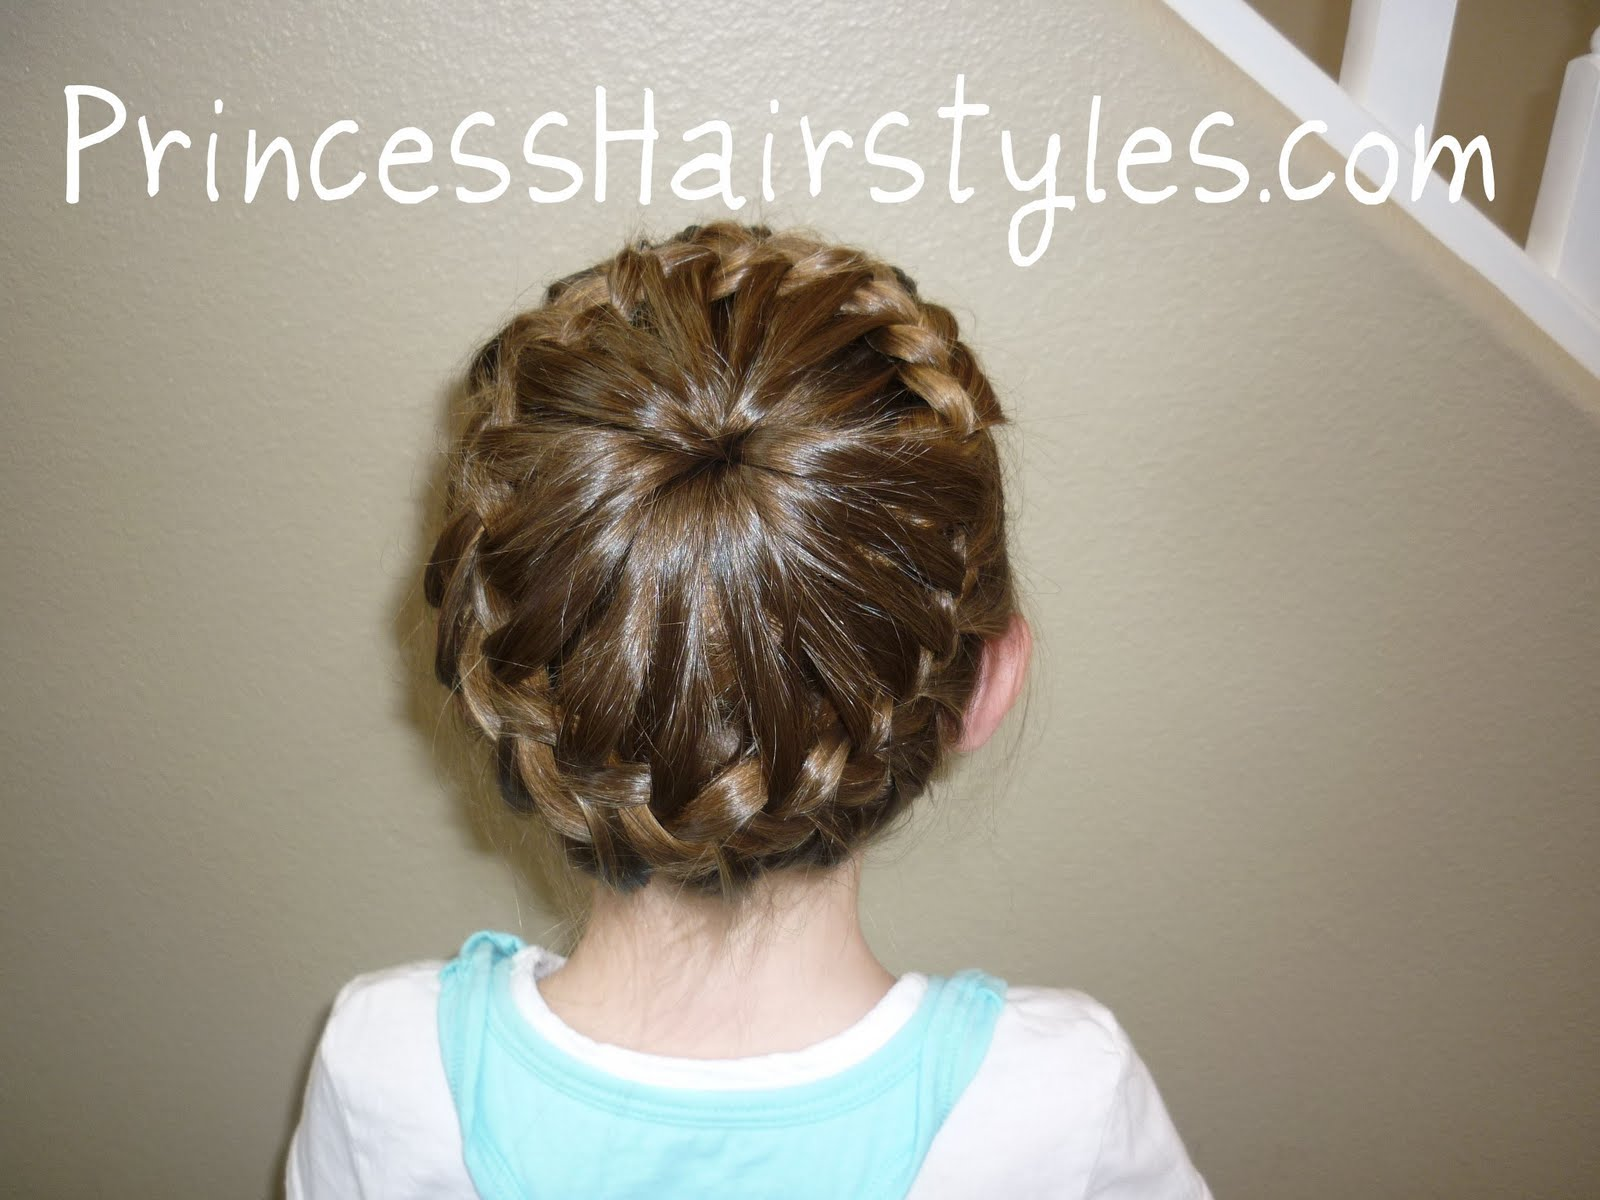 Strange Never Ending French Braid Bun Hairstyles For Girls Princess Hairstyles For Women Draintrainus